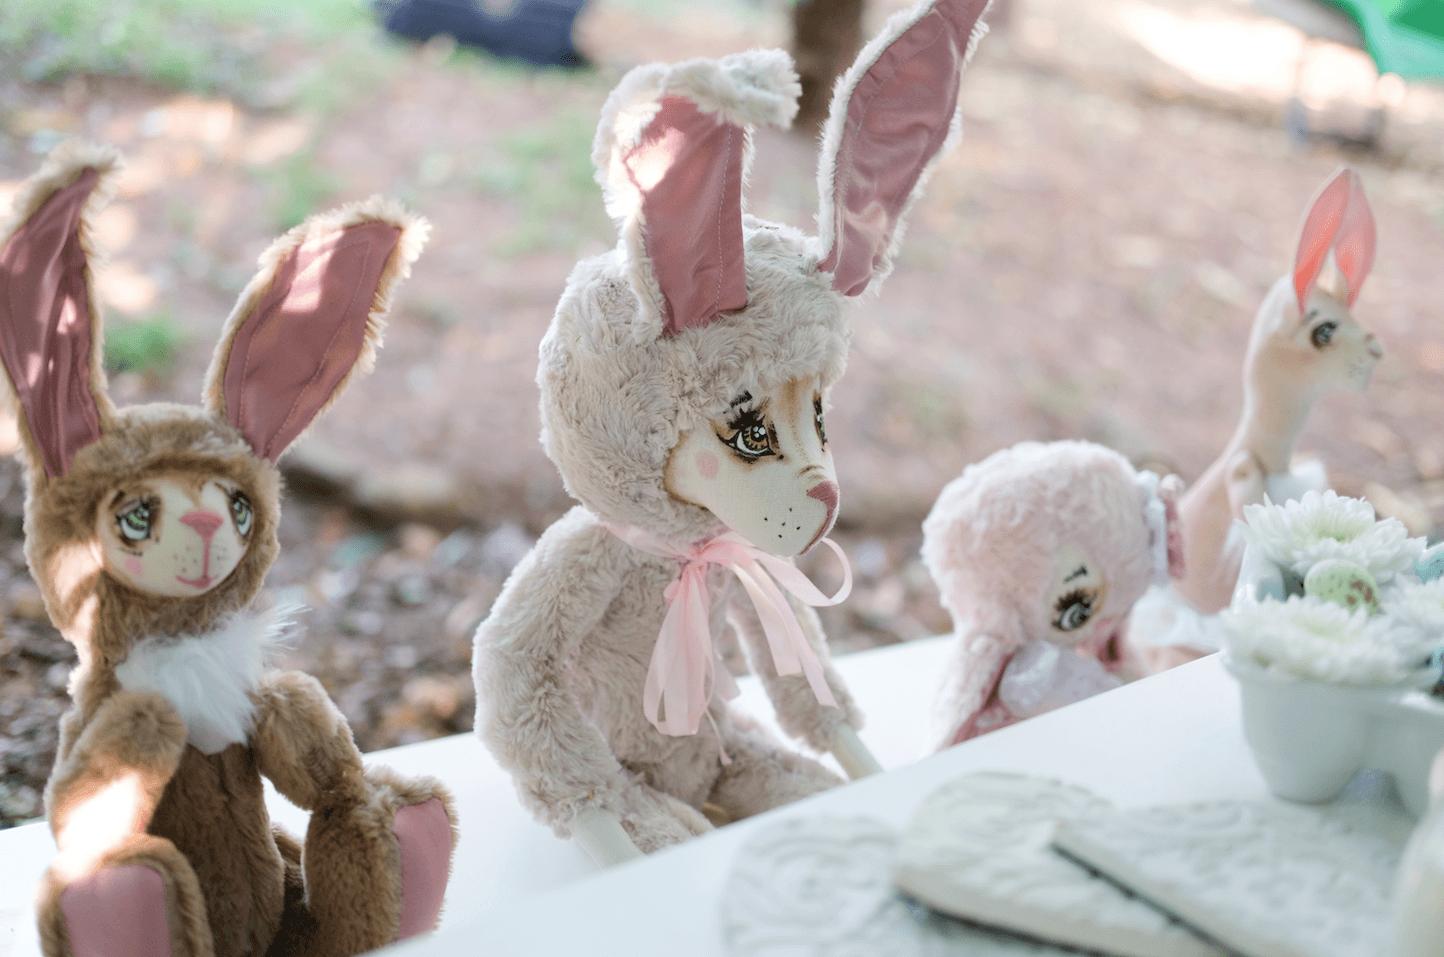 Easter Garden Party, Introducing Easter with a DIY Easter Garden party